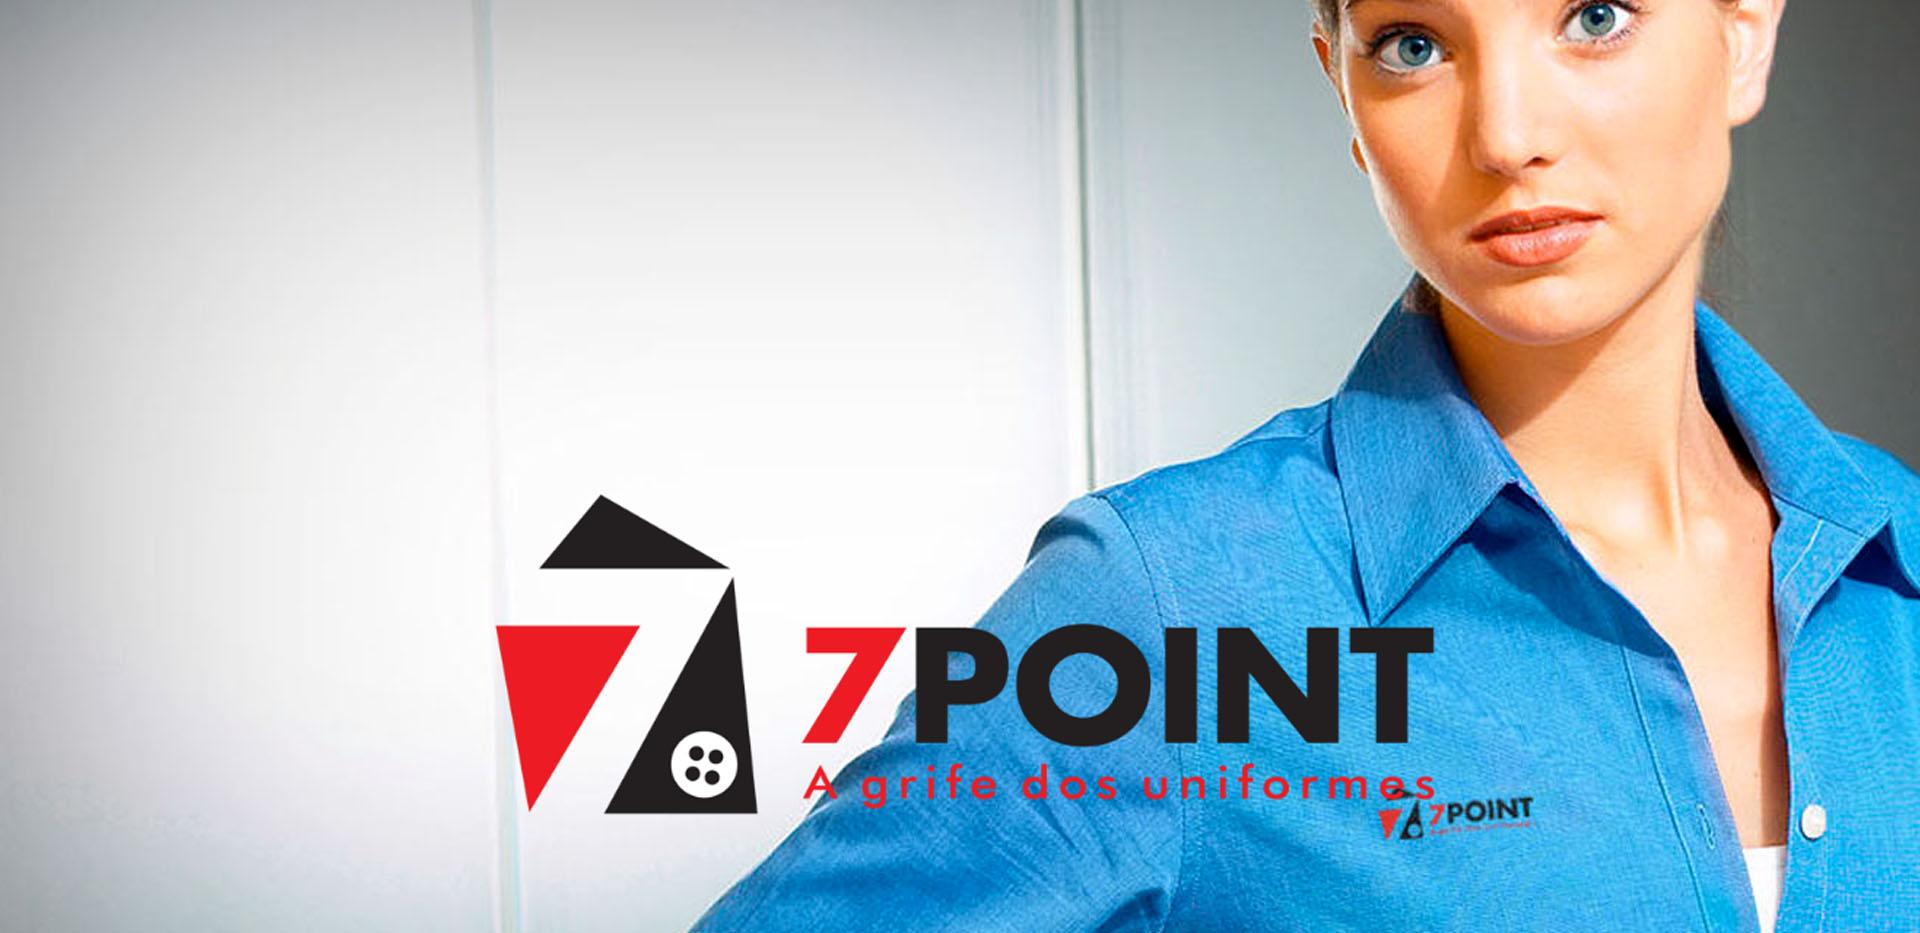 cd34b17d6a51f Home - 7 Point